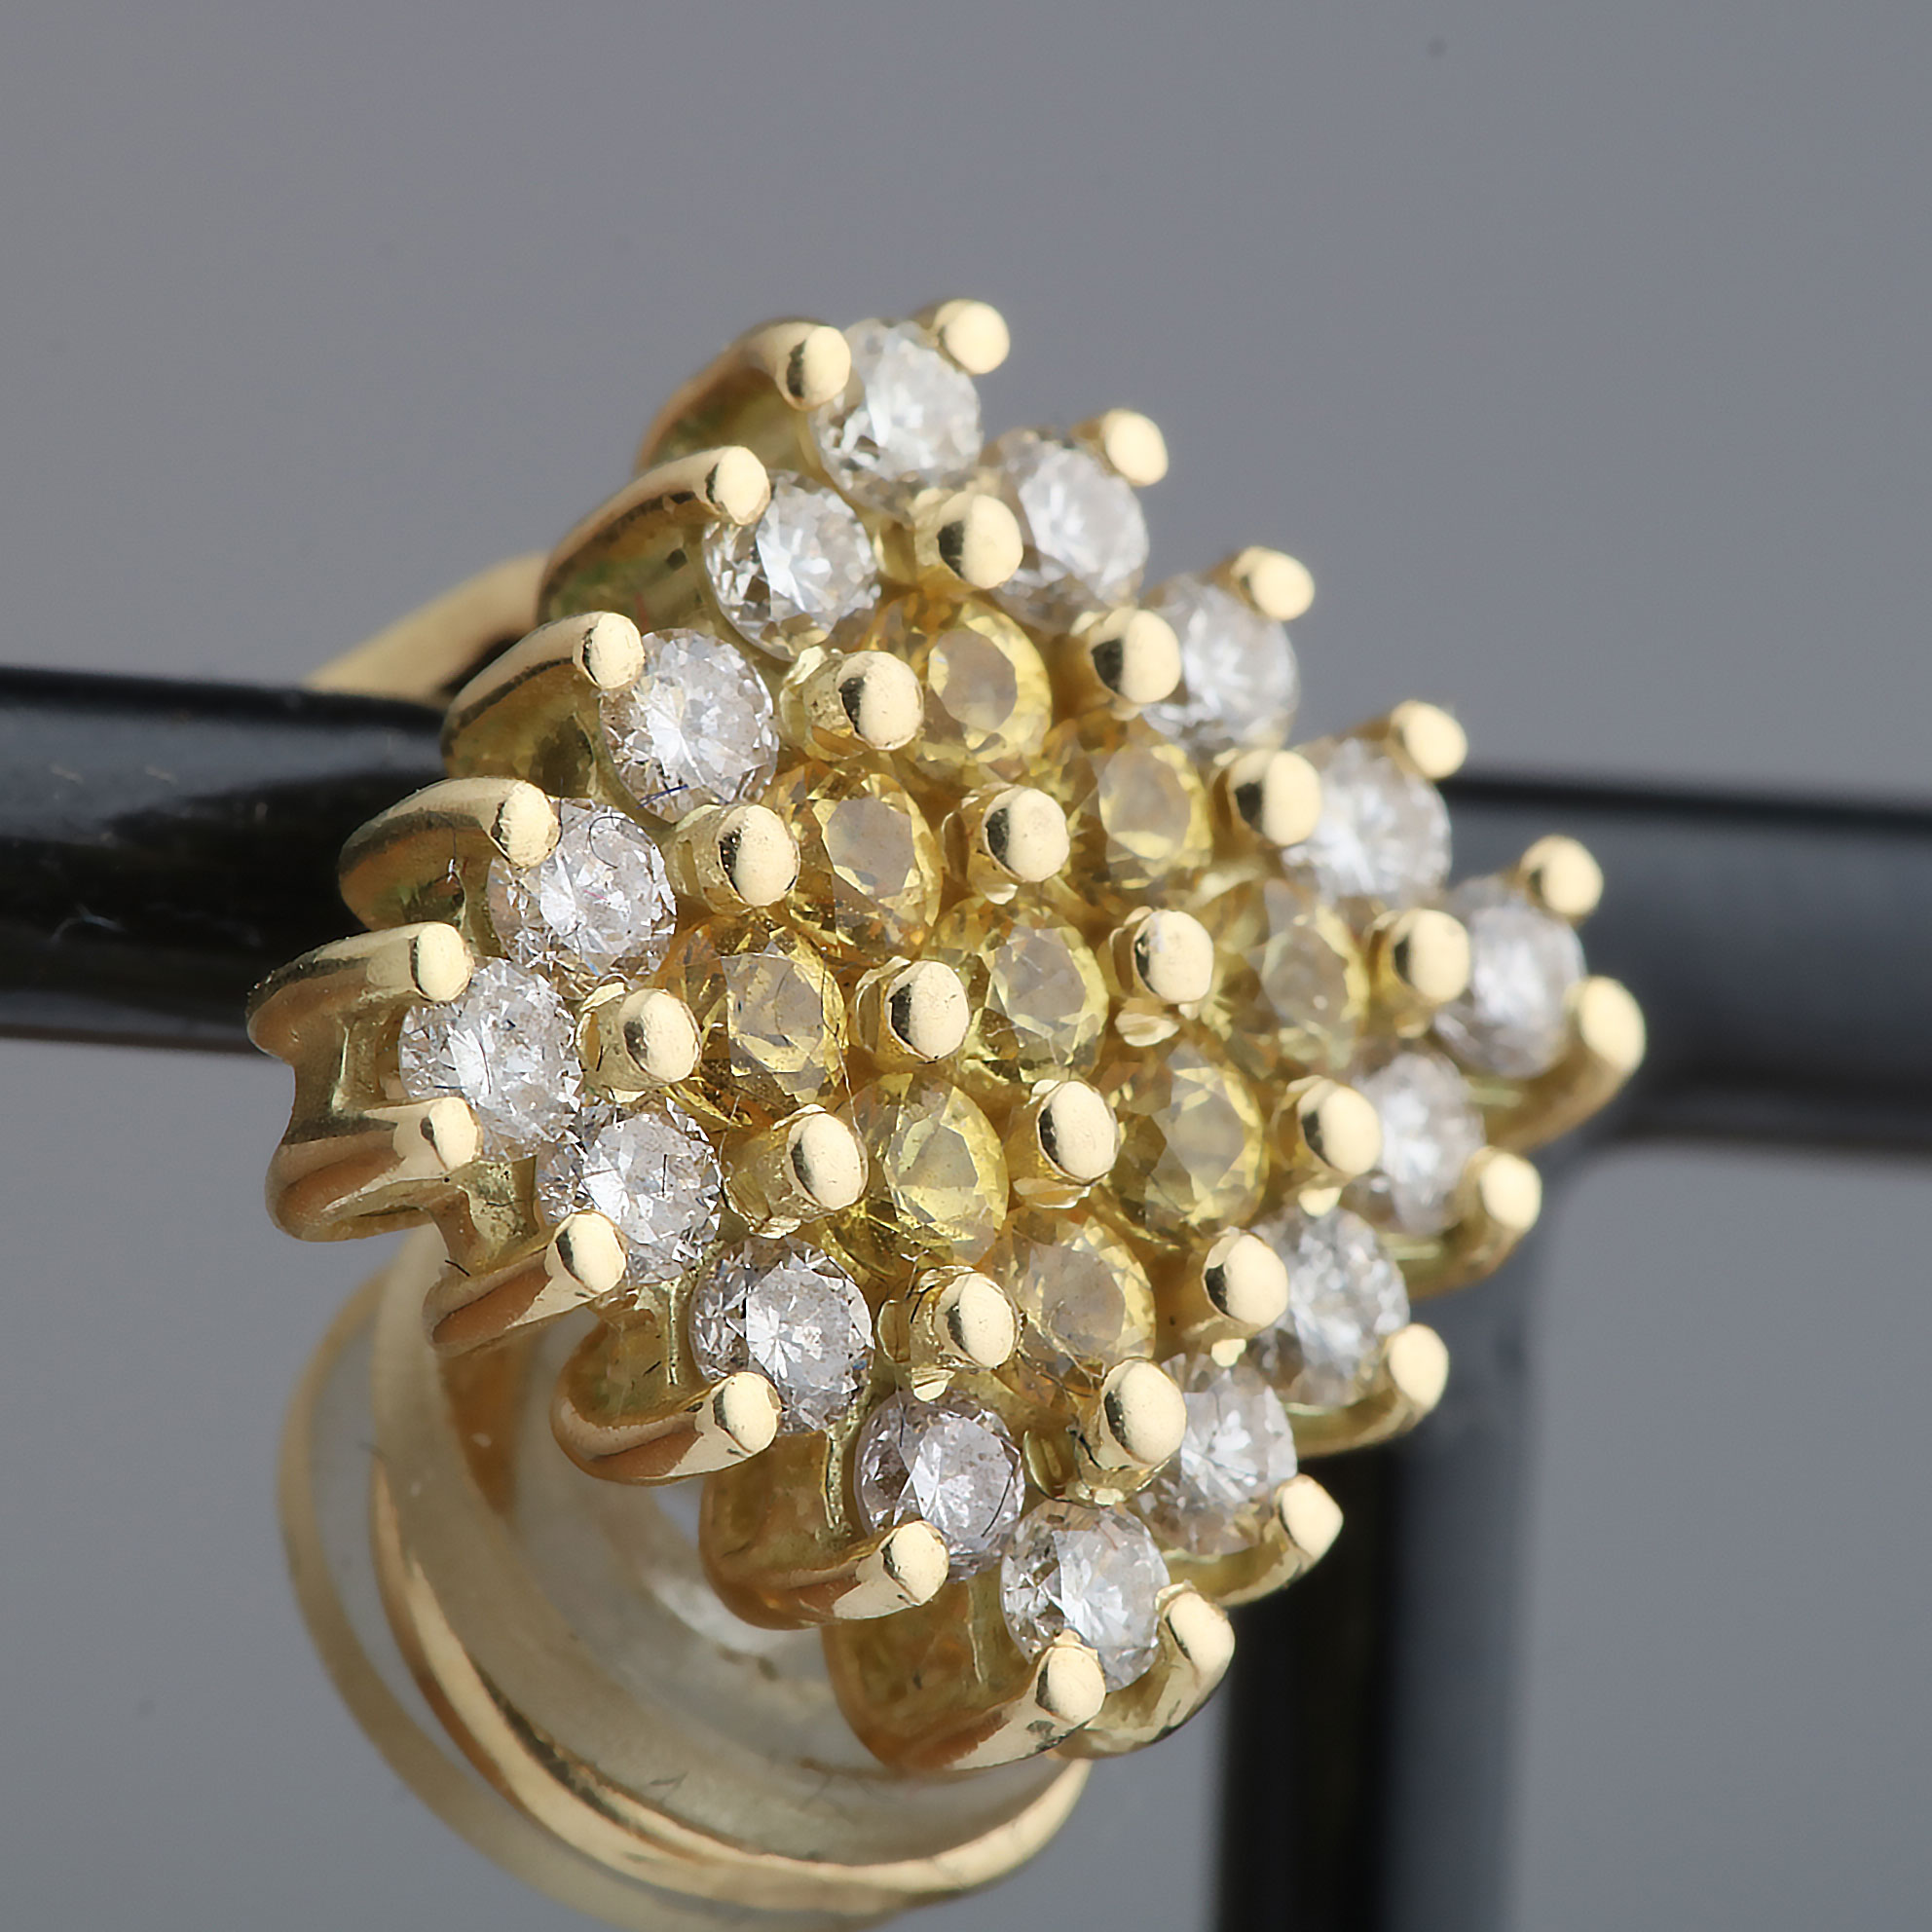 Ørepynt m. klips, gult gull, diamant (0,96 ct), safir (0,54 ct)